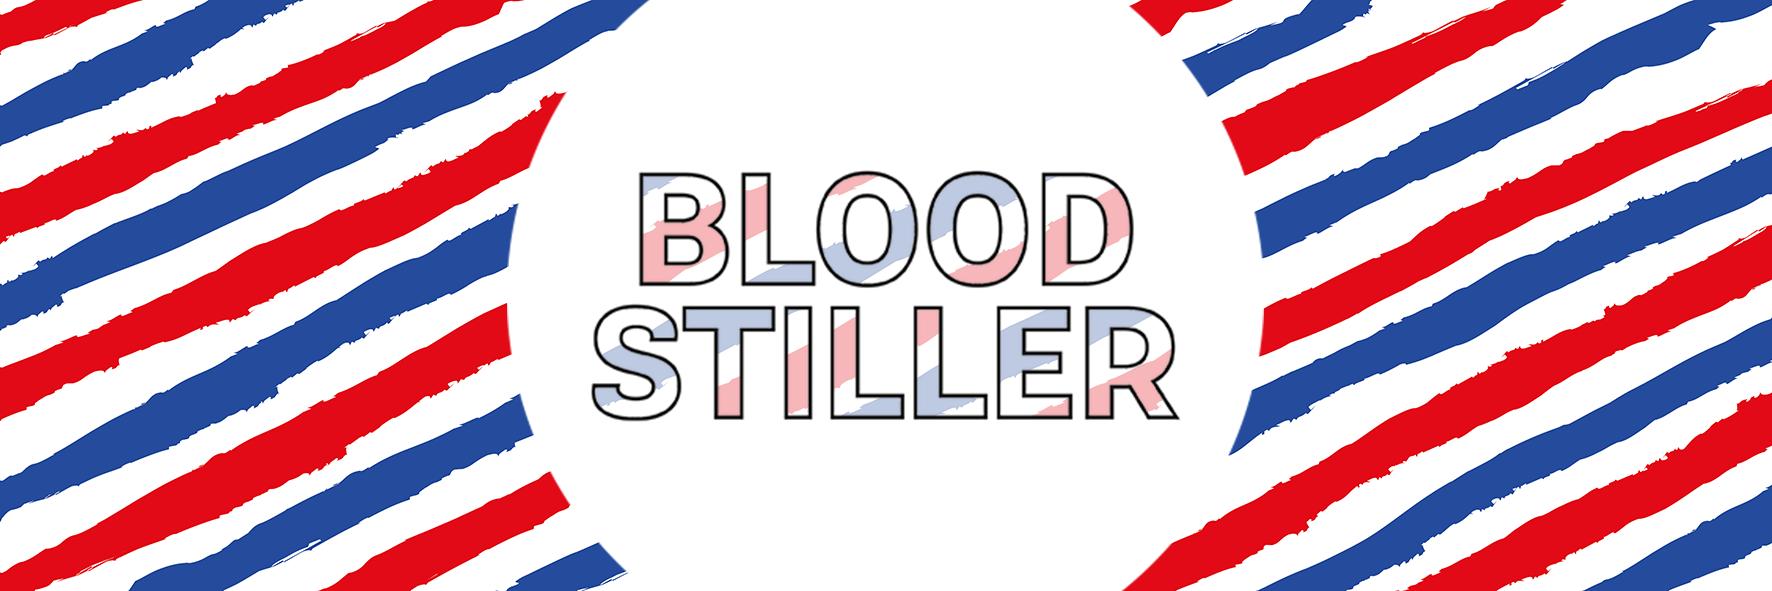 Blood-Stiller